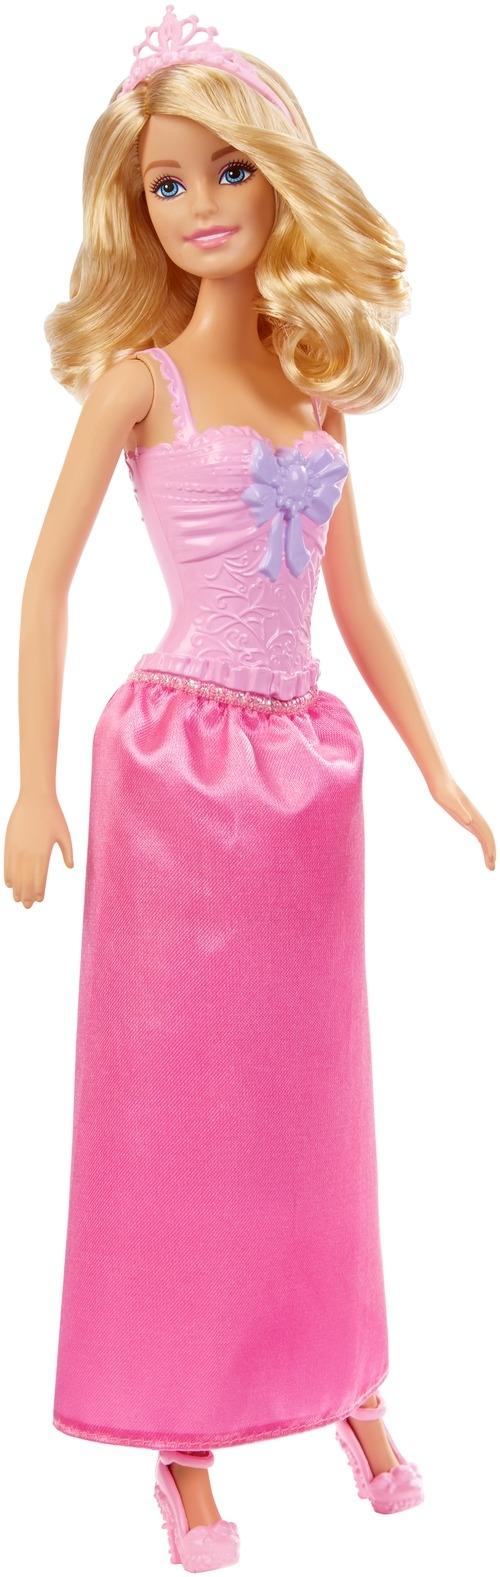 Barbie Barbie Кукла Barbie «Принцесса» в асс. кукла barbie 2014 principessa